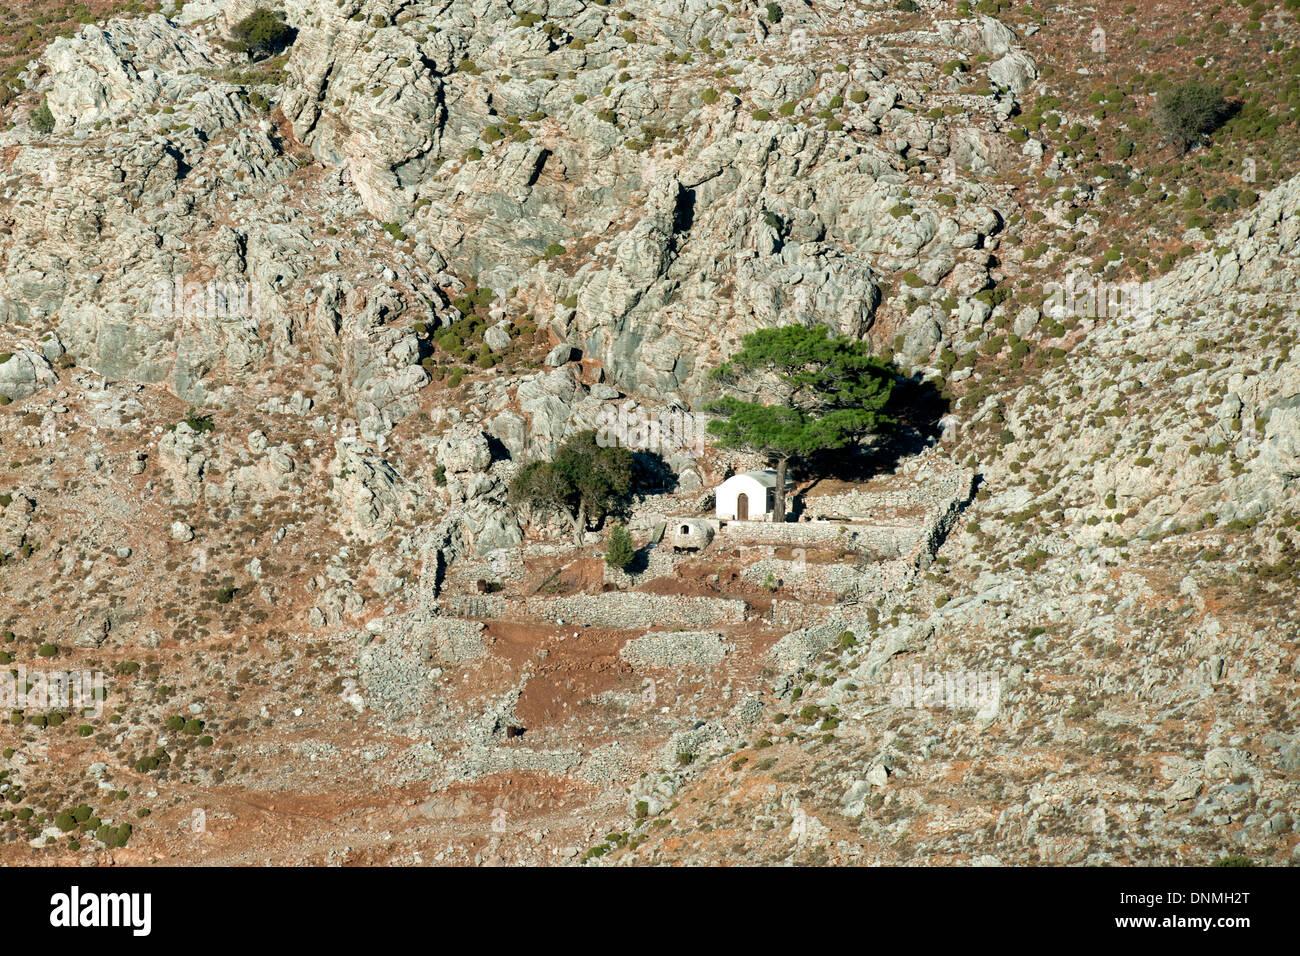 Griechenland, Insel Tilos, Bucht von Livadia, byzantinische Kapelle Agios Pavlos - Stock Image